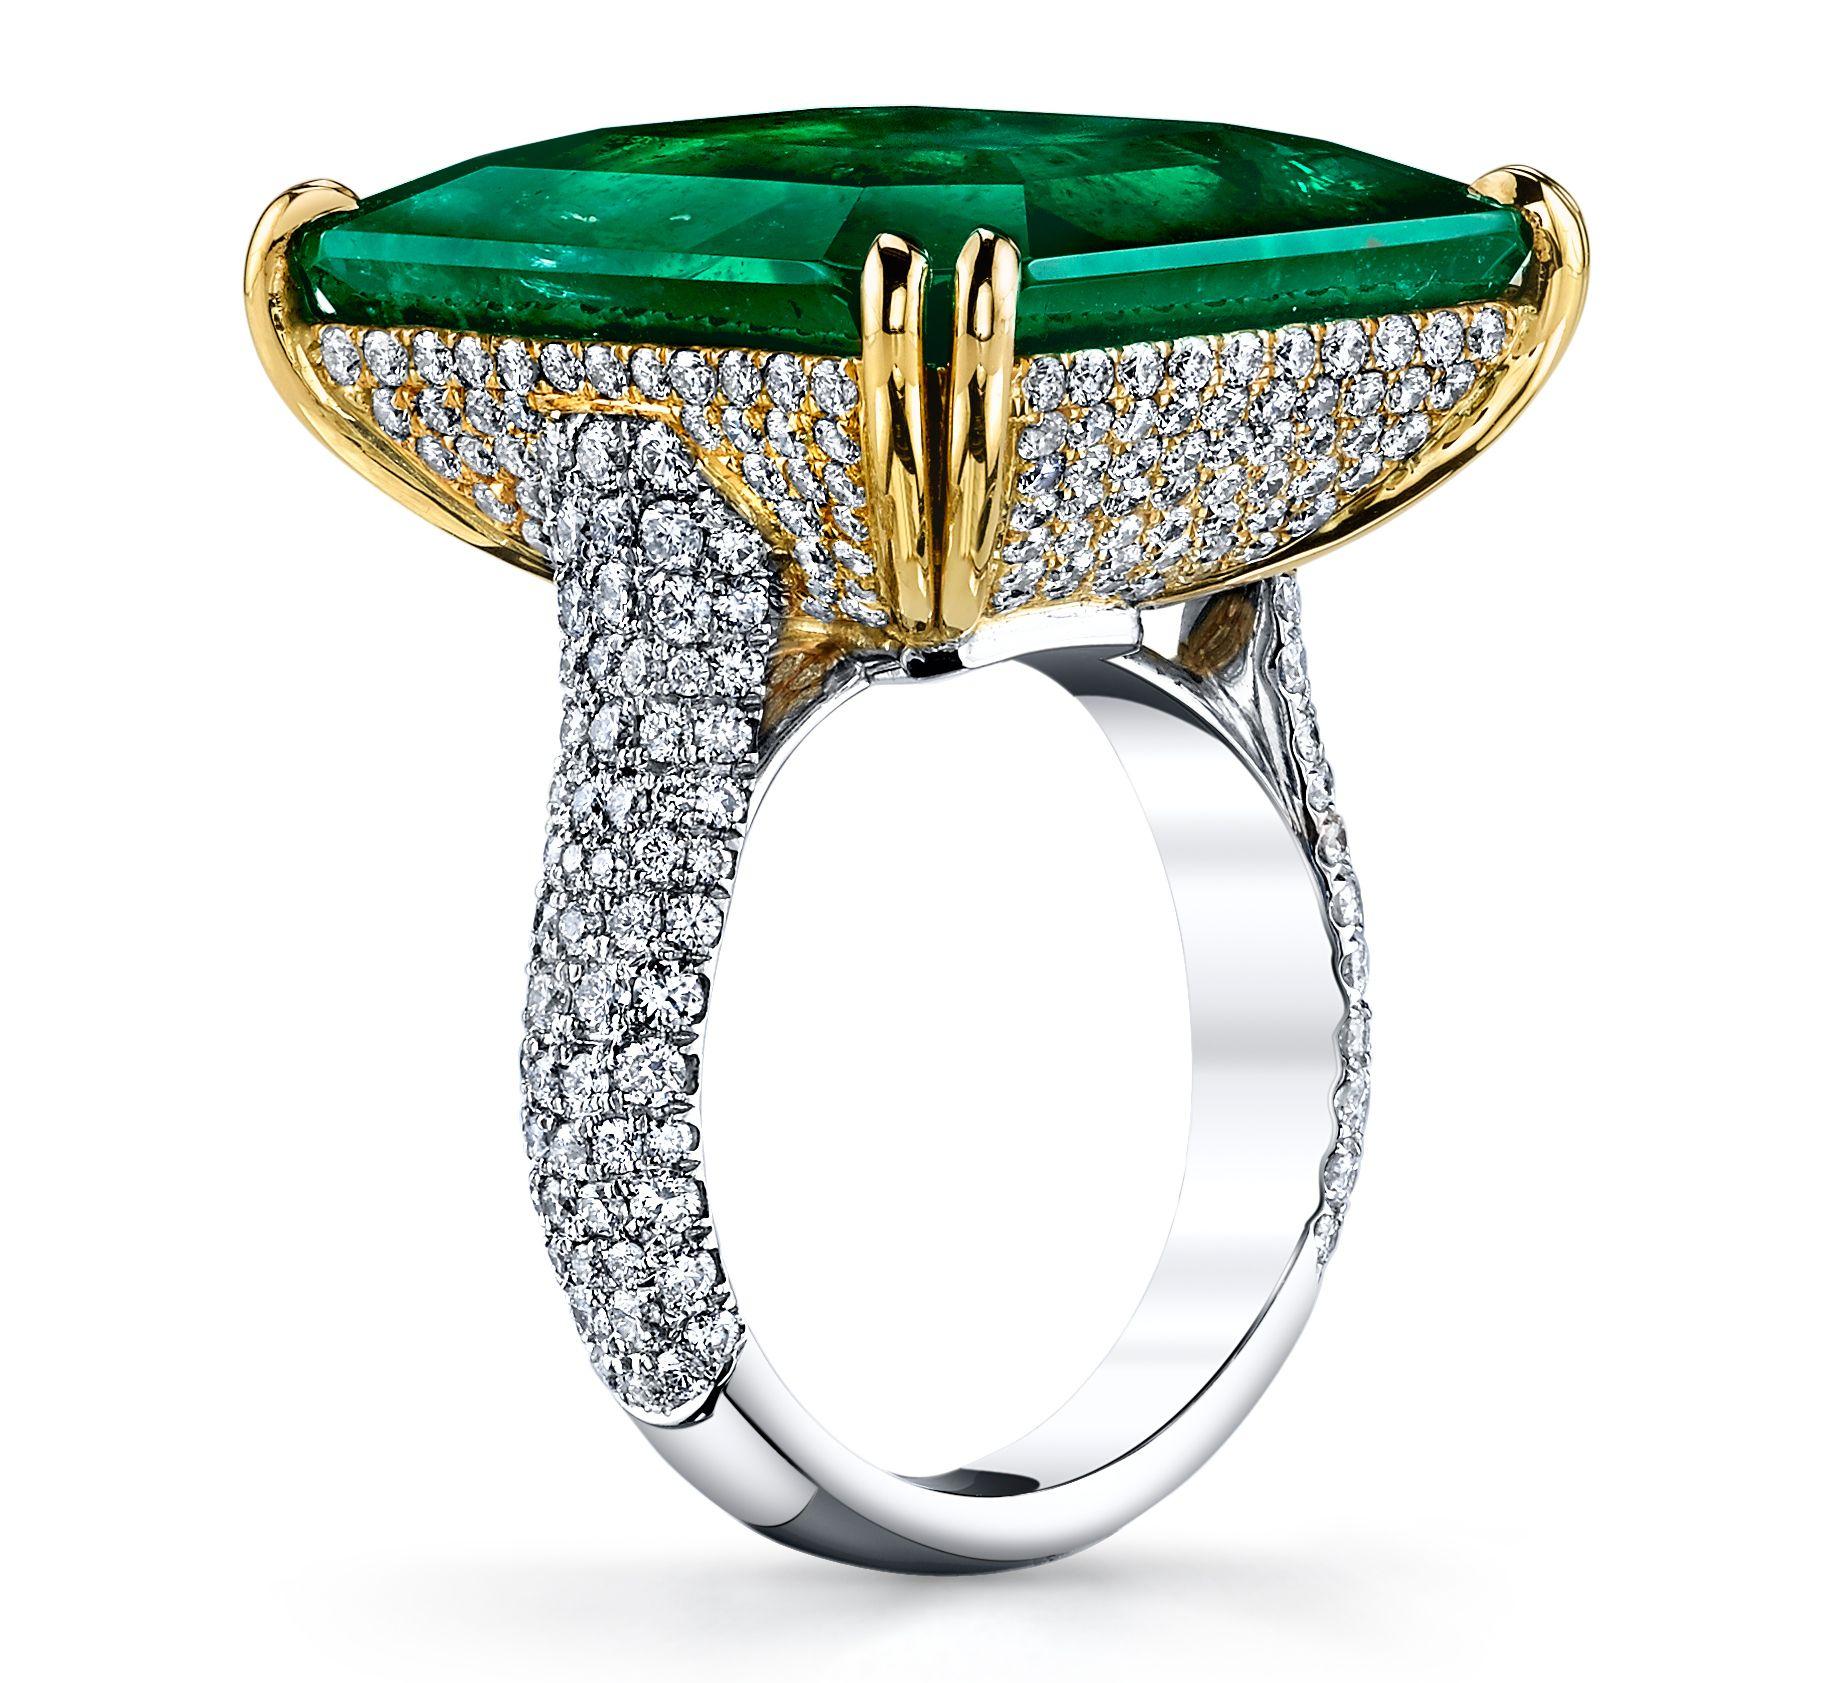 8718d52c68ead Joshua J emerald and diamond ring | JCK On Your Market | Emerald ...